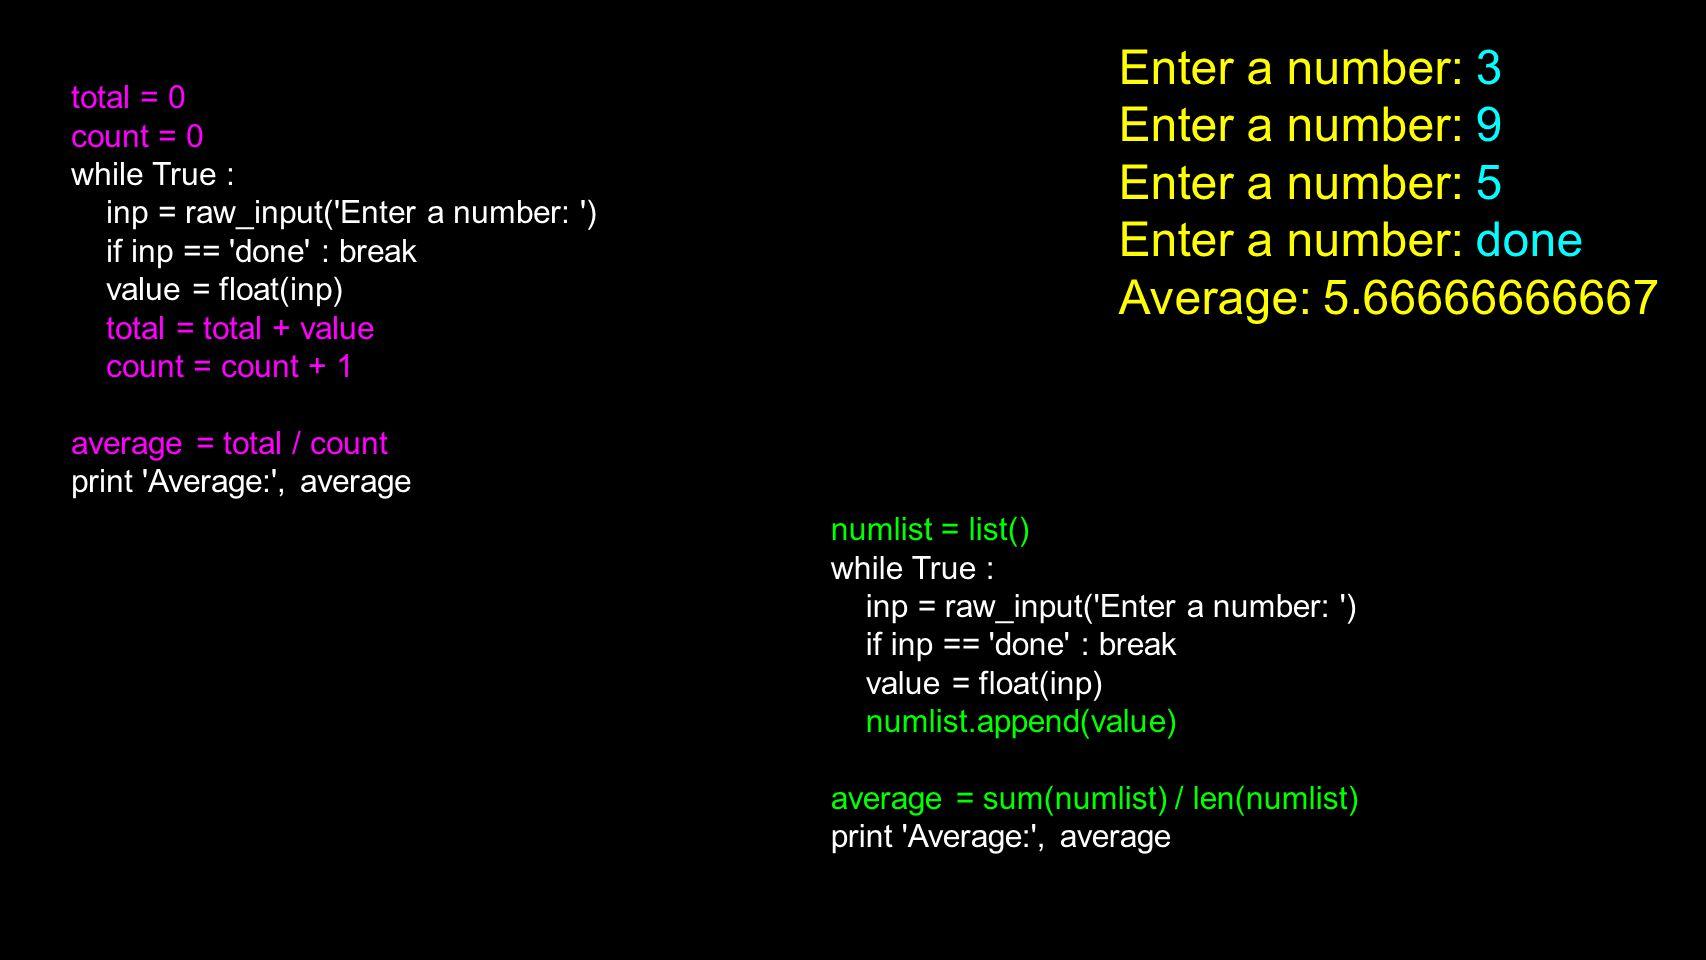 numlist = list() while True : inp = raw_input('Enter a number: ') if inp == 'done' : break value = float(inp) numlist.append(value) average = sum(numl